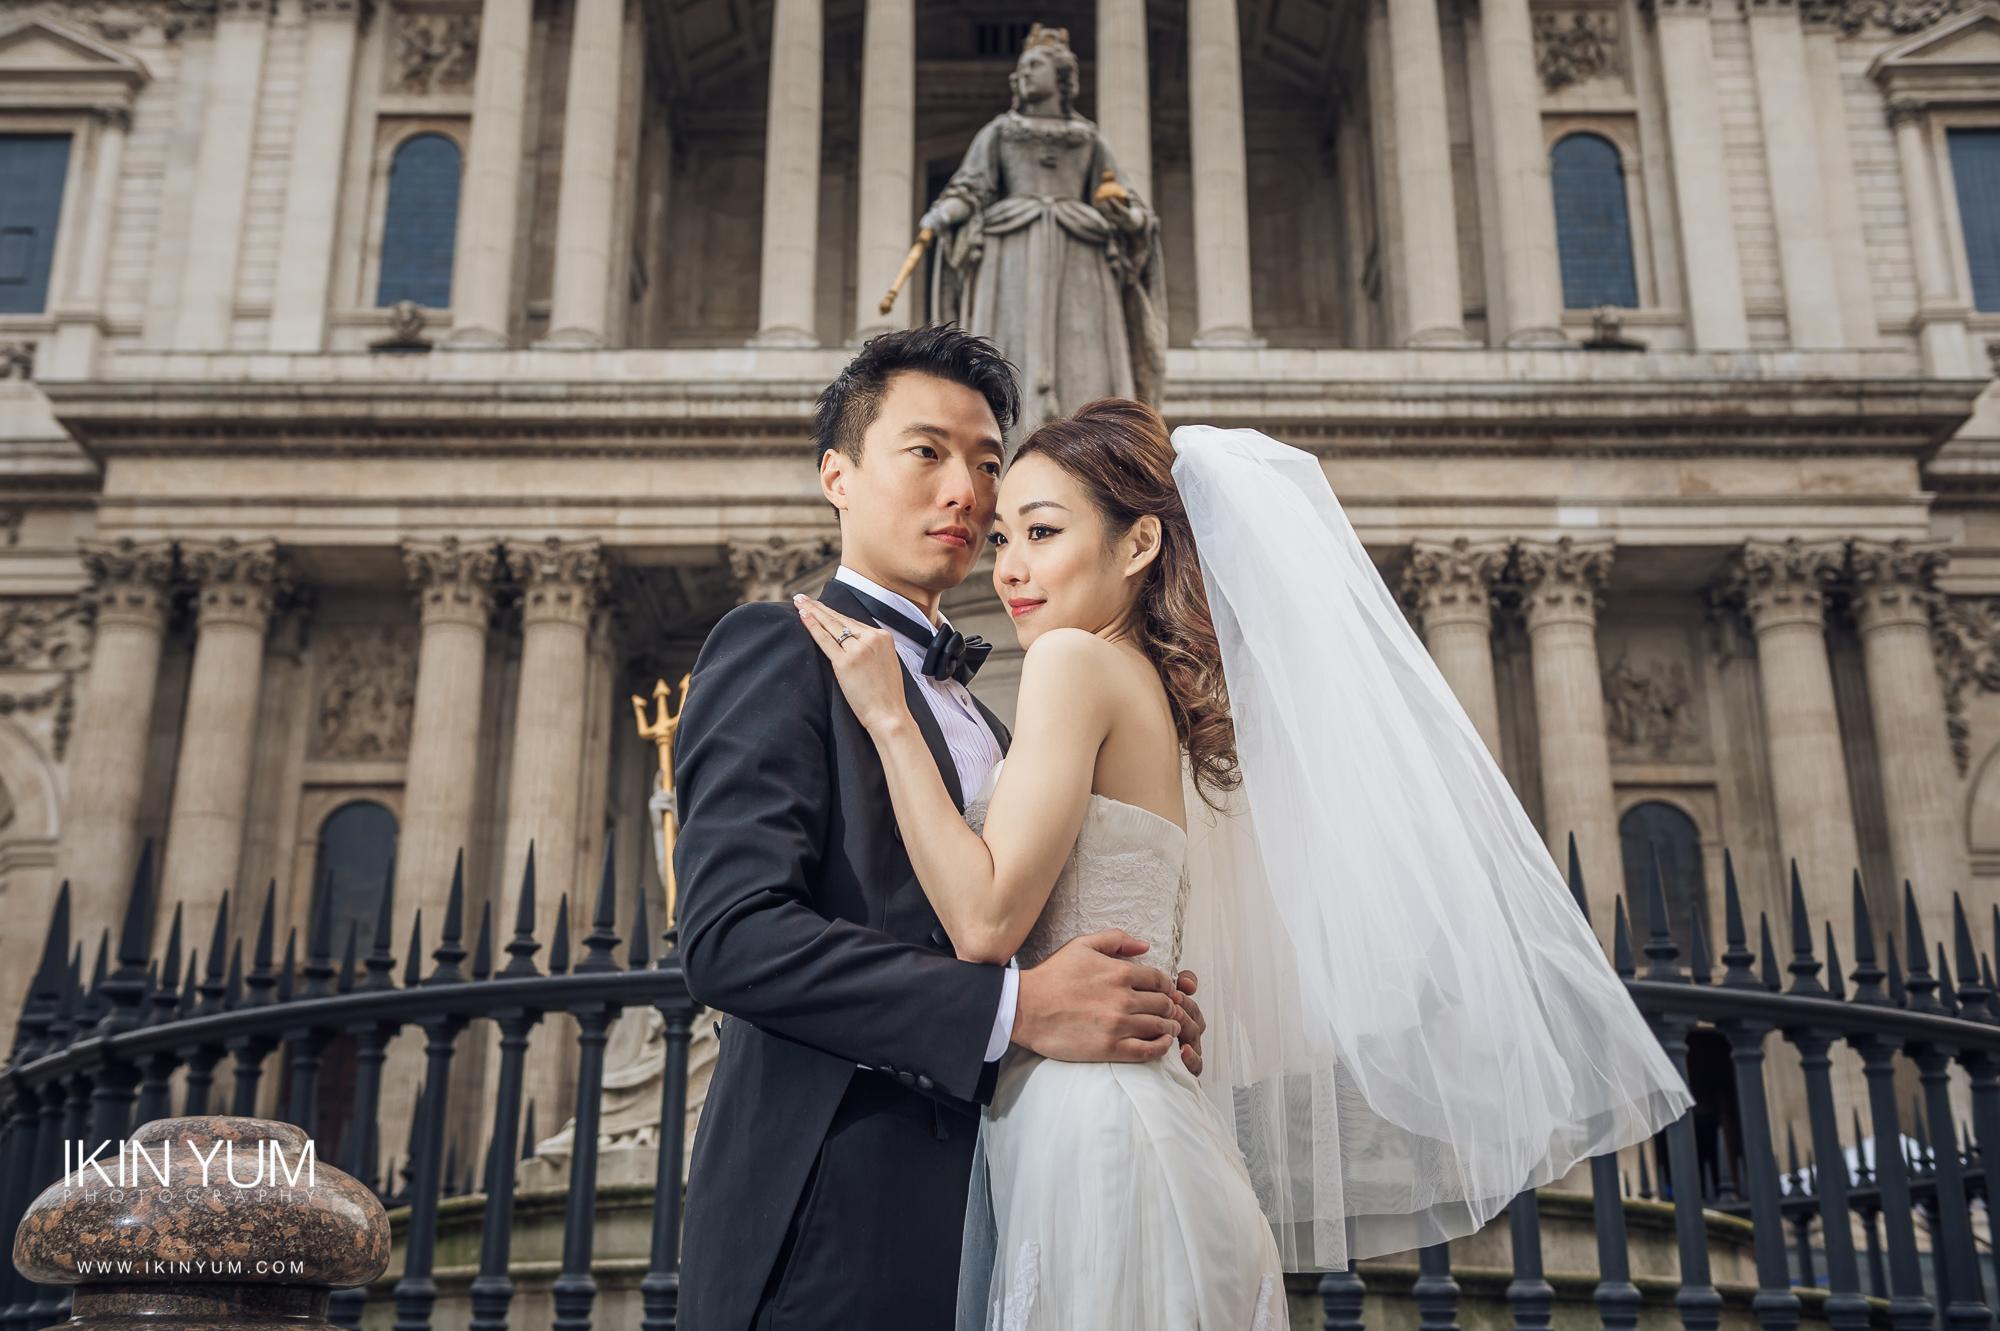 Yannis & Kenny Pre-Wedding Shoot - Ikin Yum Photography-0005.jpg